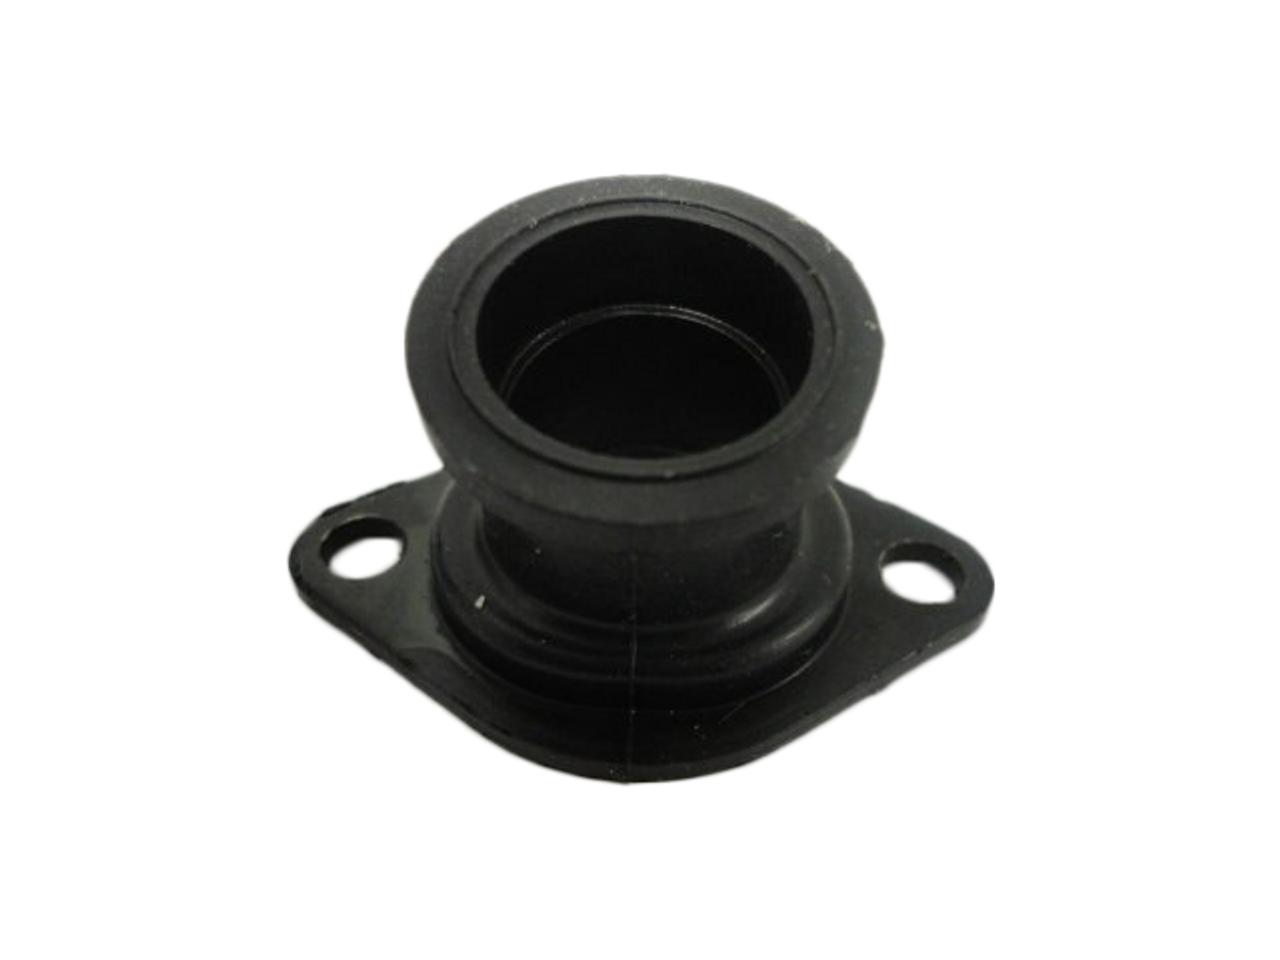 Set Screw Type NBK MJC-65-EGR-15-1 1//4 Jaw Flexible Coupling Aluminum A2017 Bore Diameters 15 mm and 1-1//4 Bore Diameters 15 mm and 1-1//4